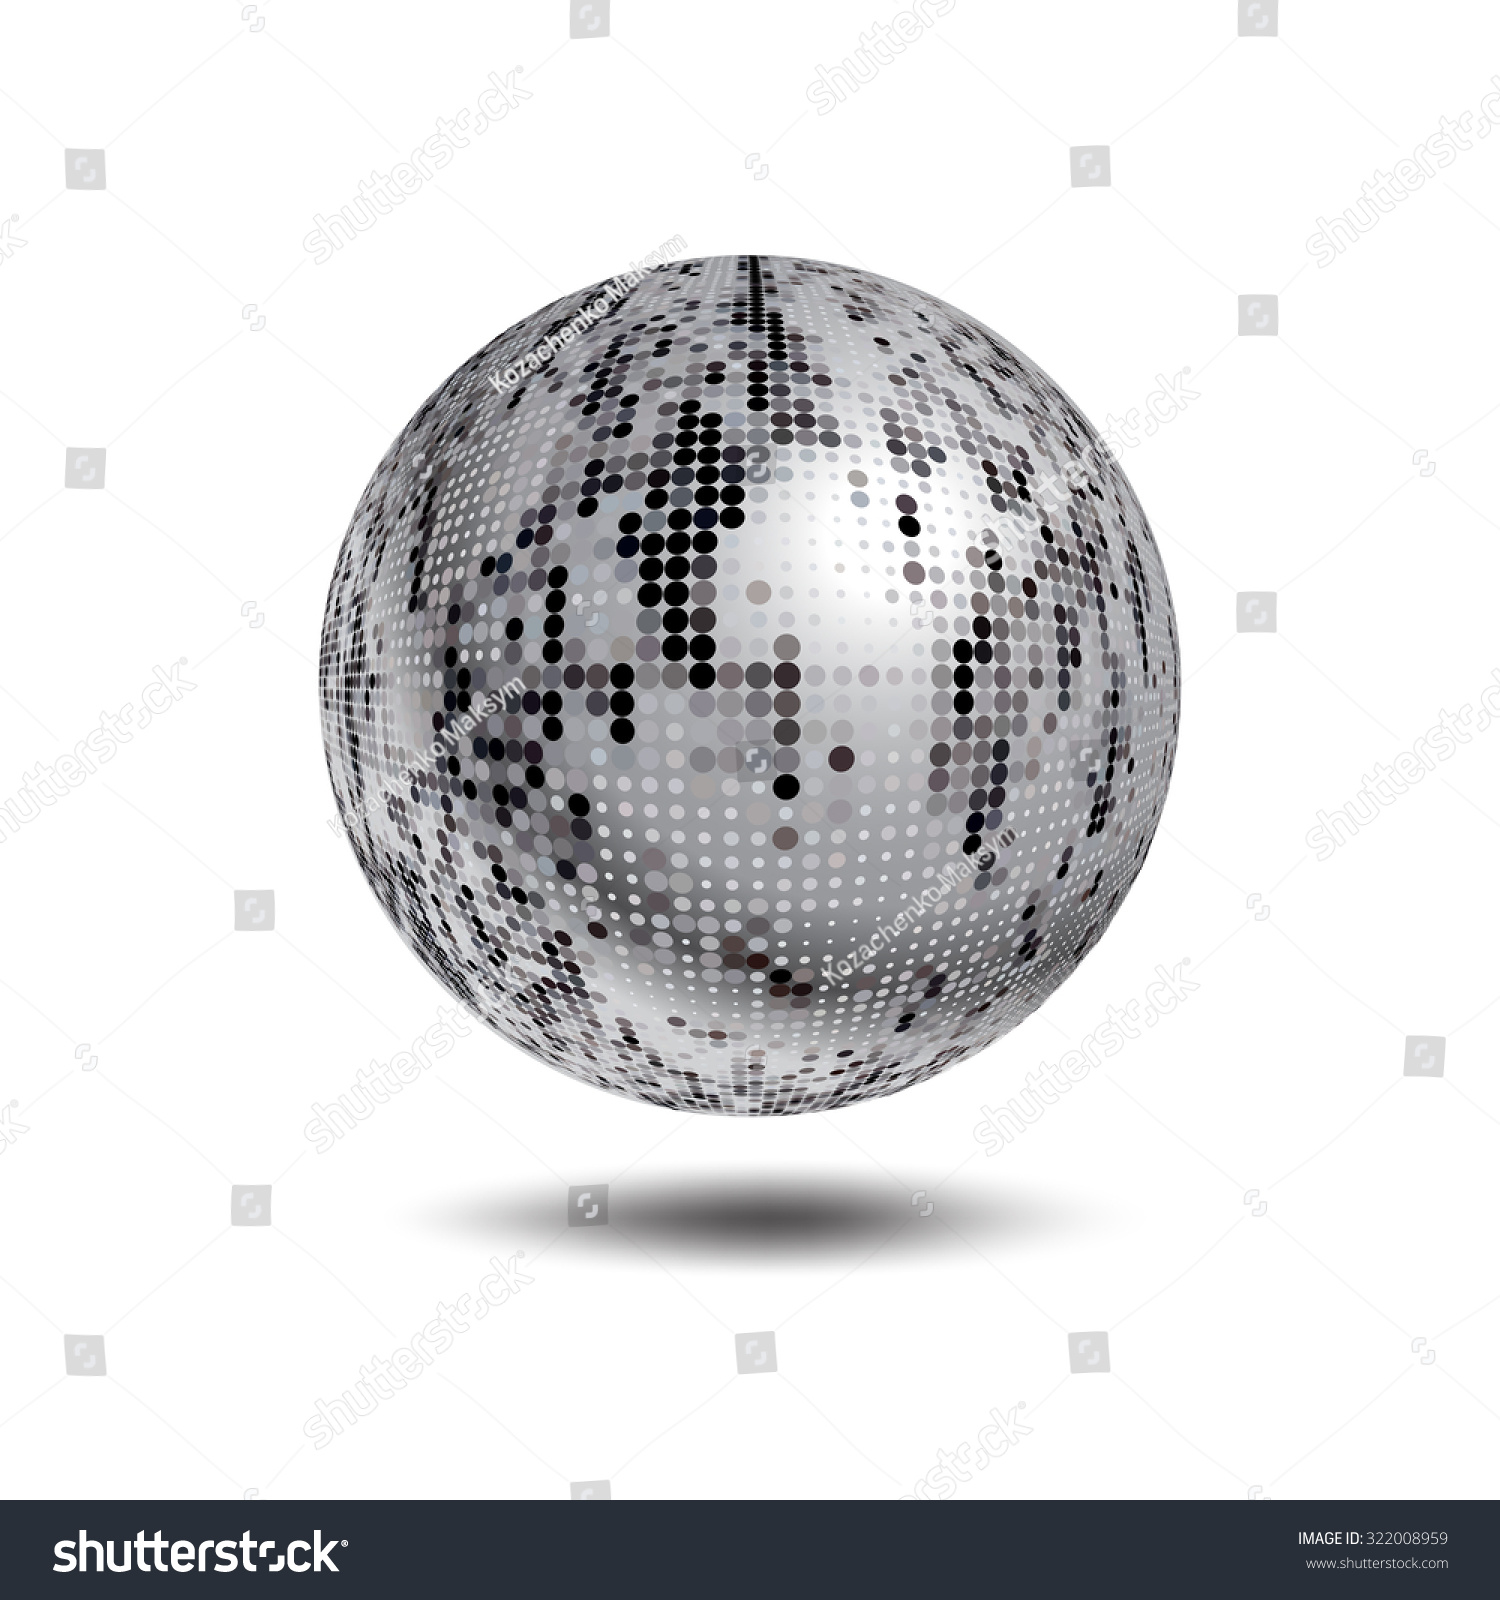 silver disco ball background - photo #14